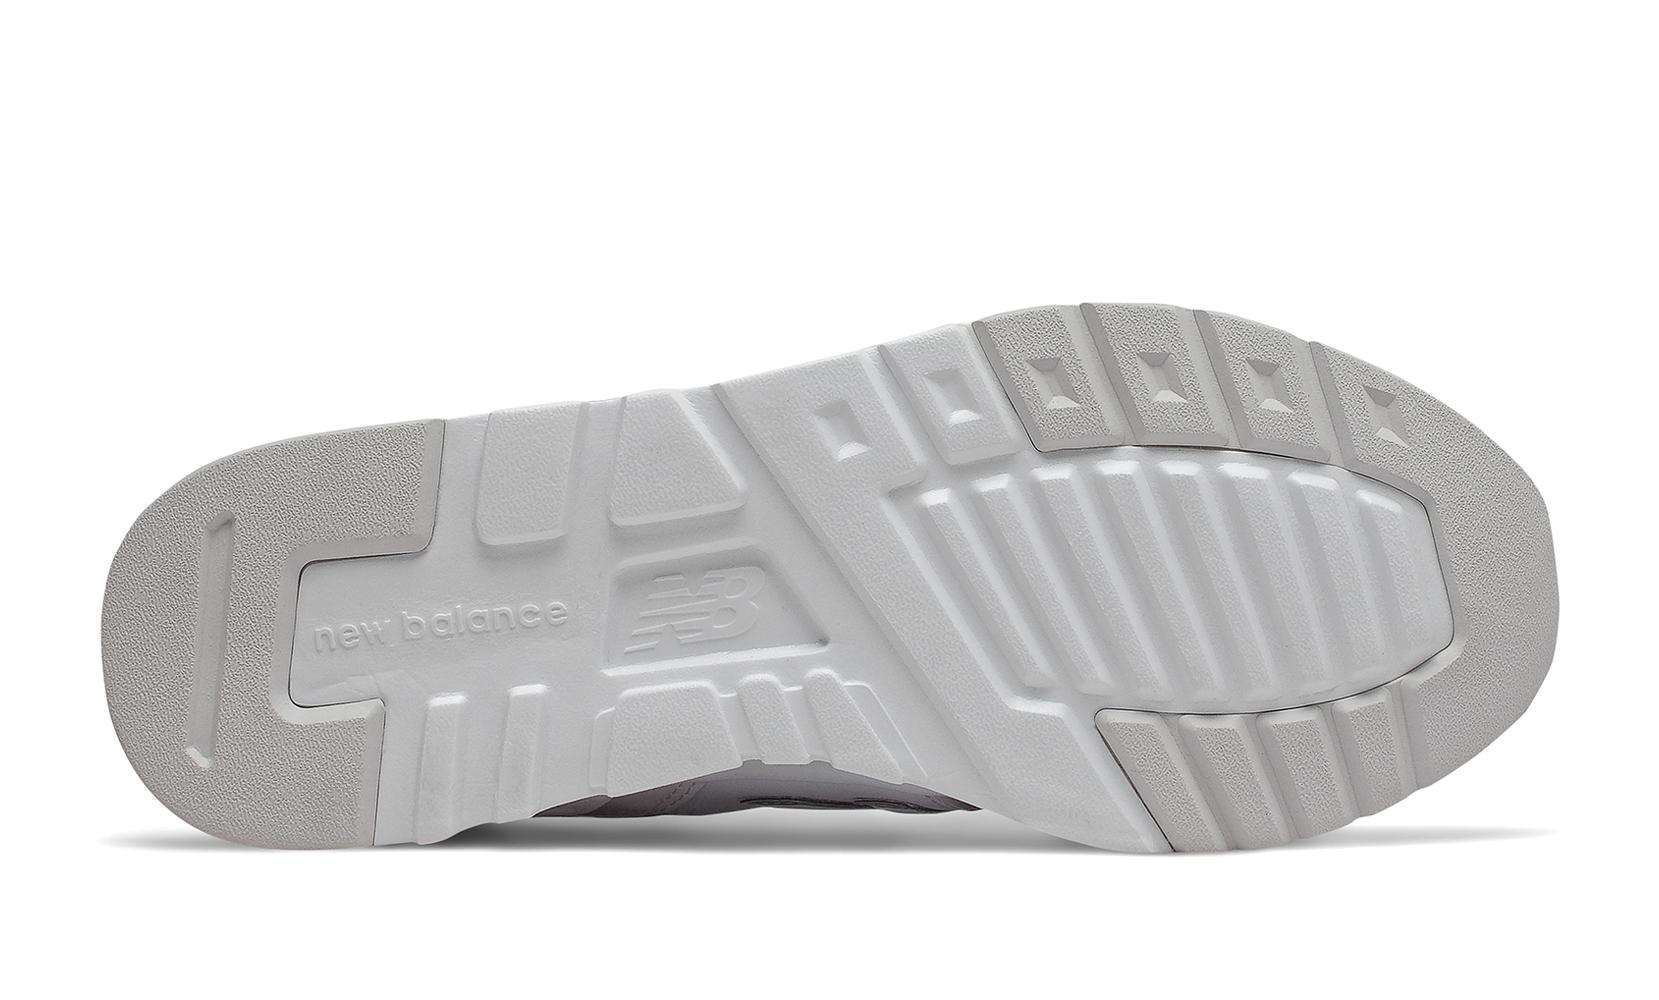 Жіноче взуття повсякденне New Balance 997Н CW997HLA | New Balance